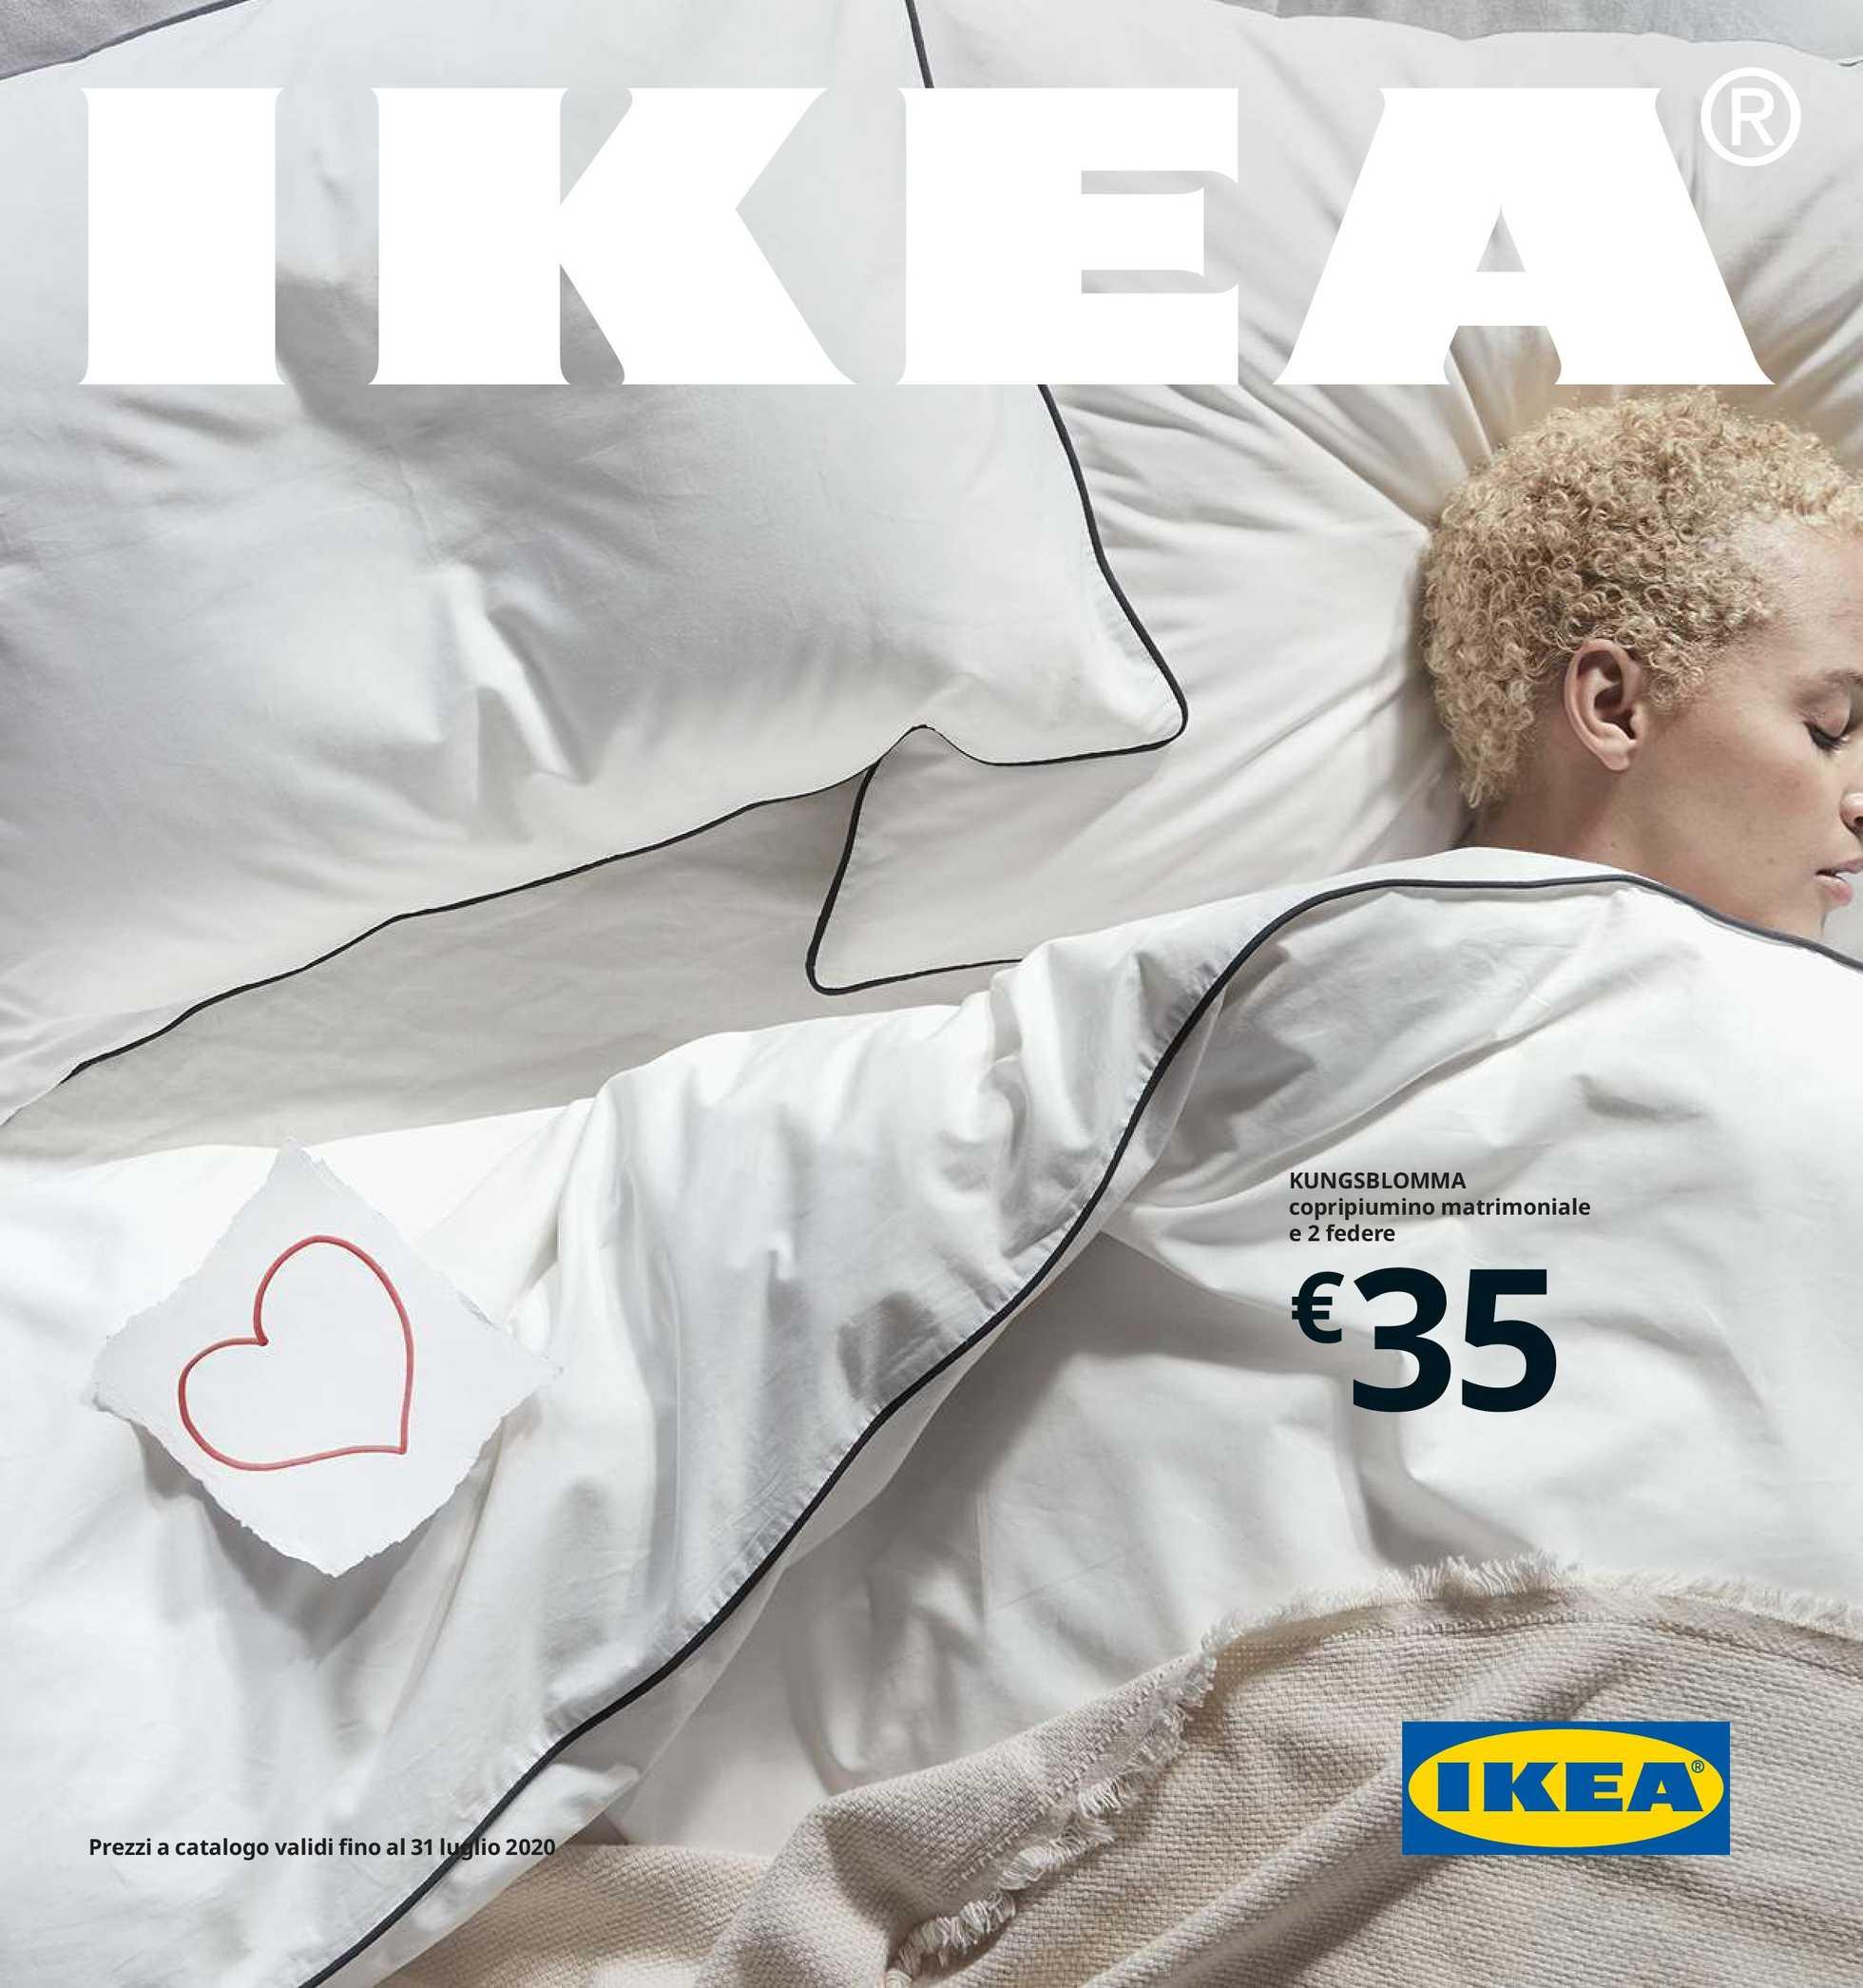 Copripiumino Matrimoniale Ikea 4 Federe.Ikea Volantini 22 08 2019 It Promotons Com